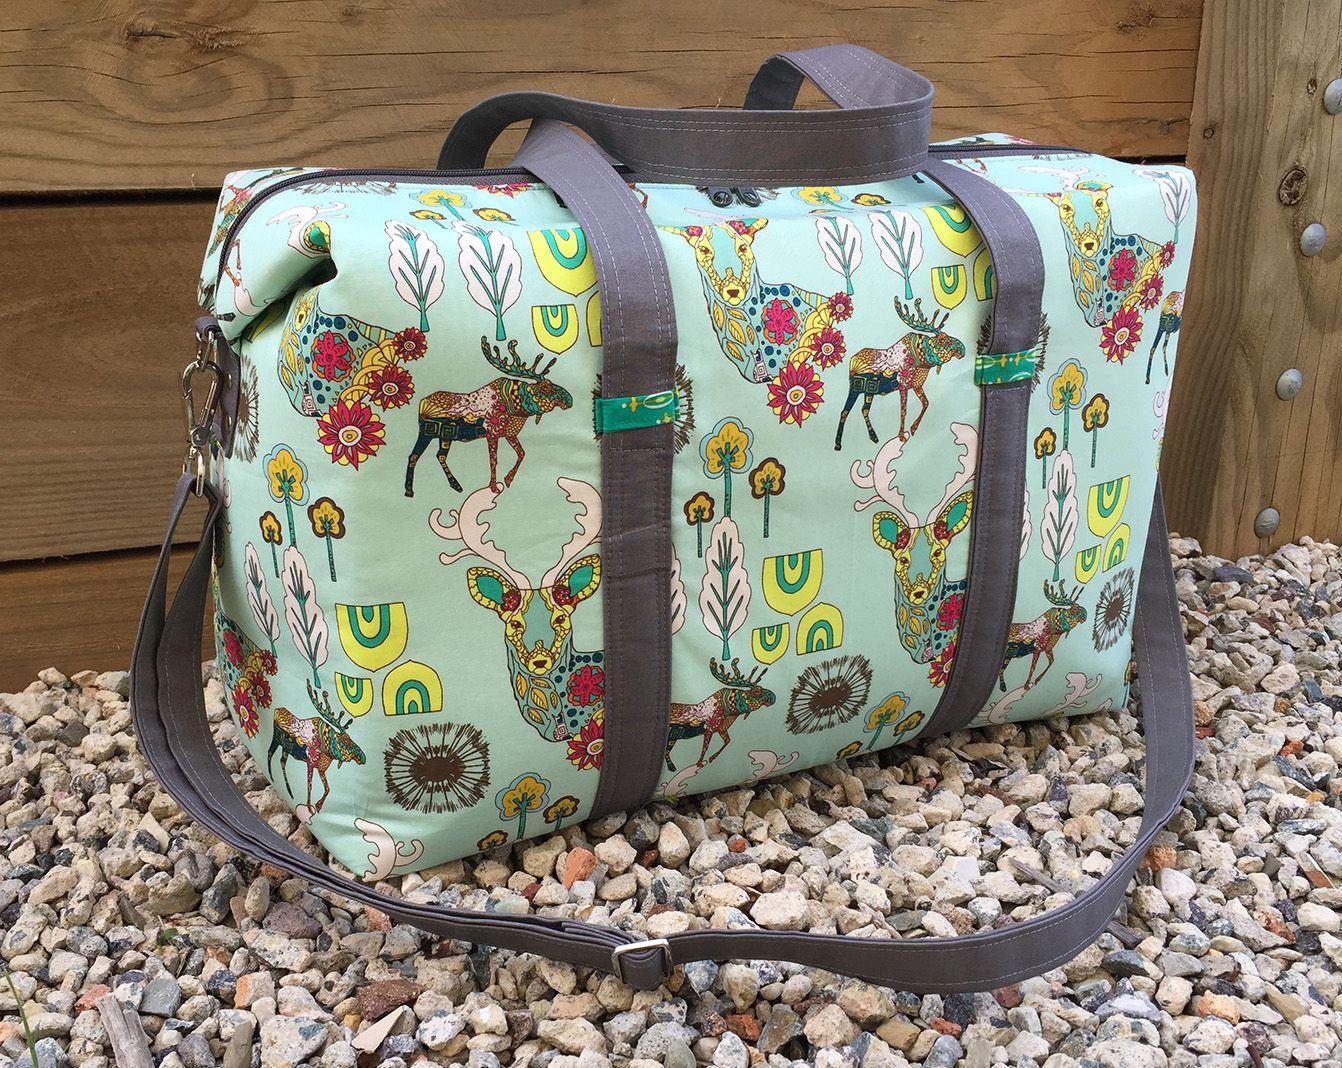 Sew Sweetness Emblem Duffle Bag sewing pattern, sewn by Melisa Jane ...